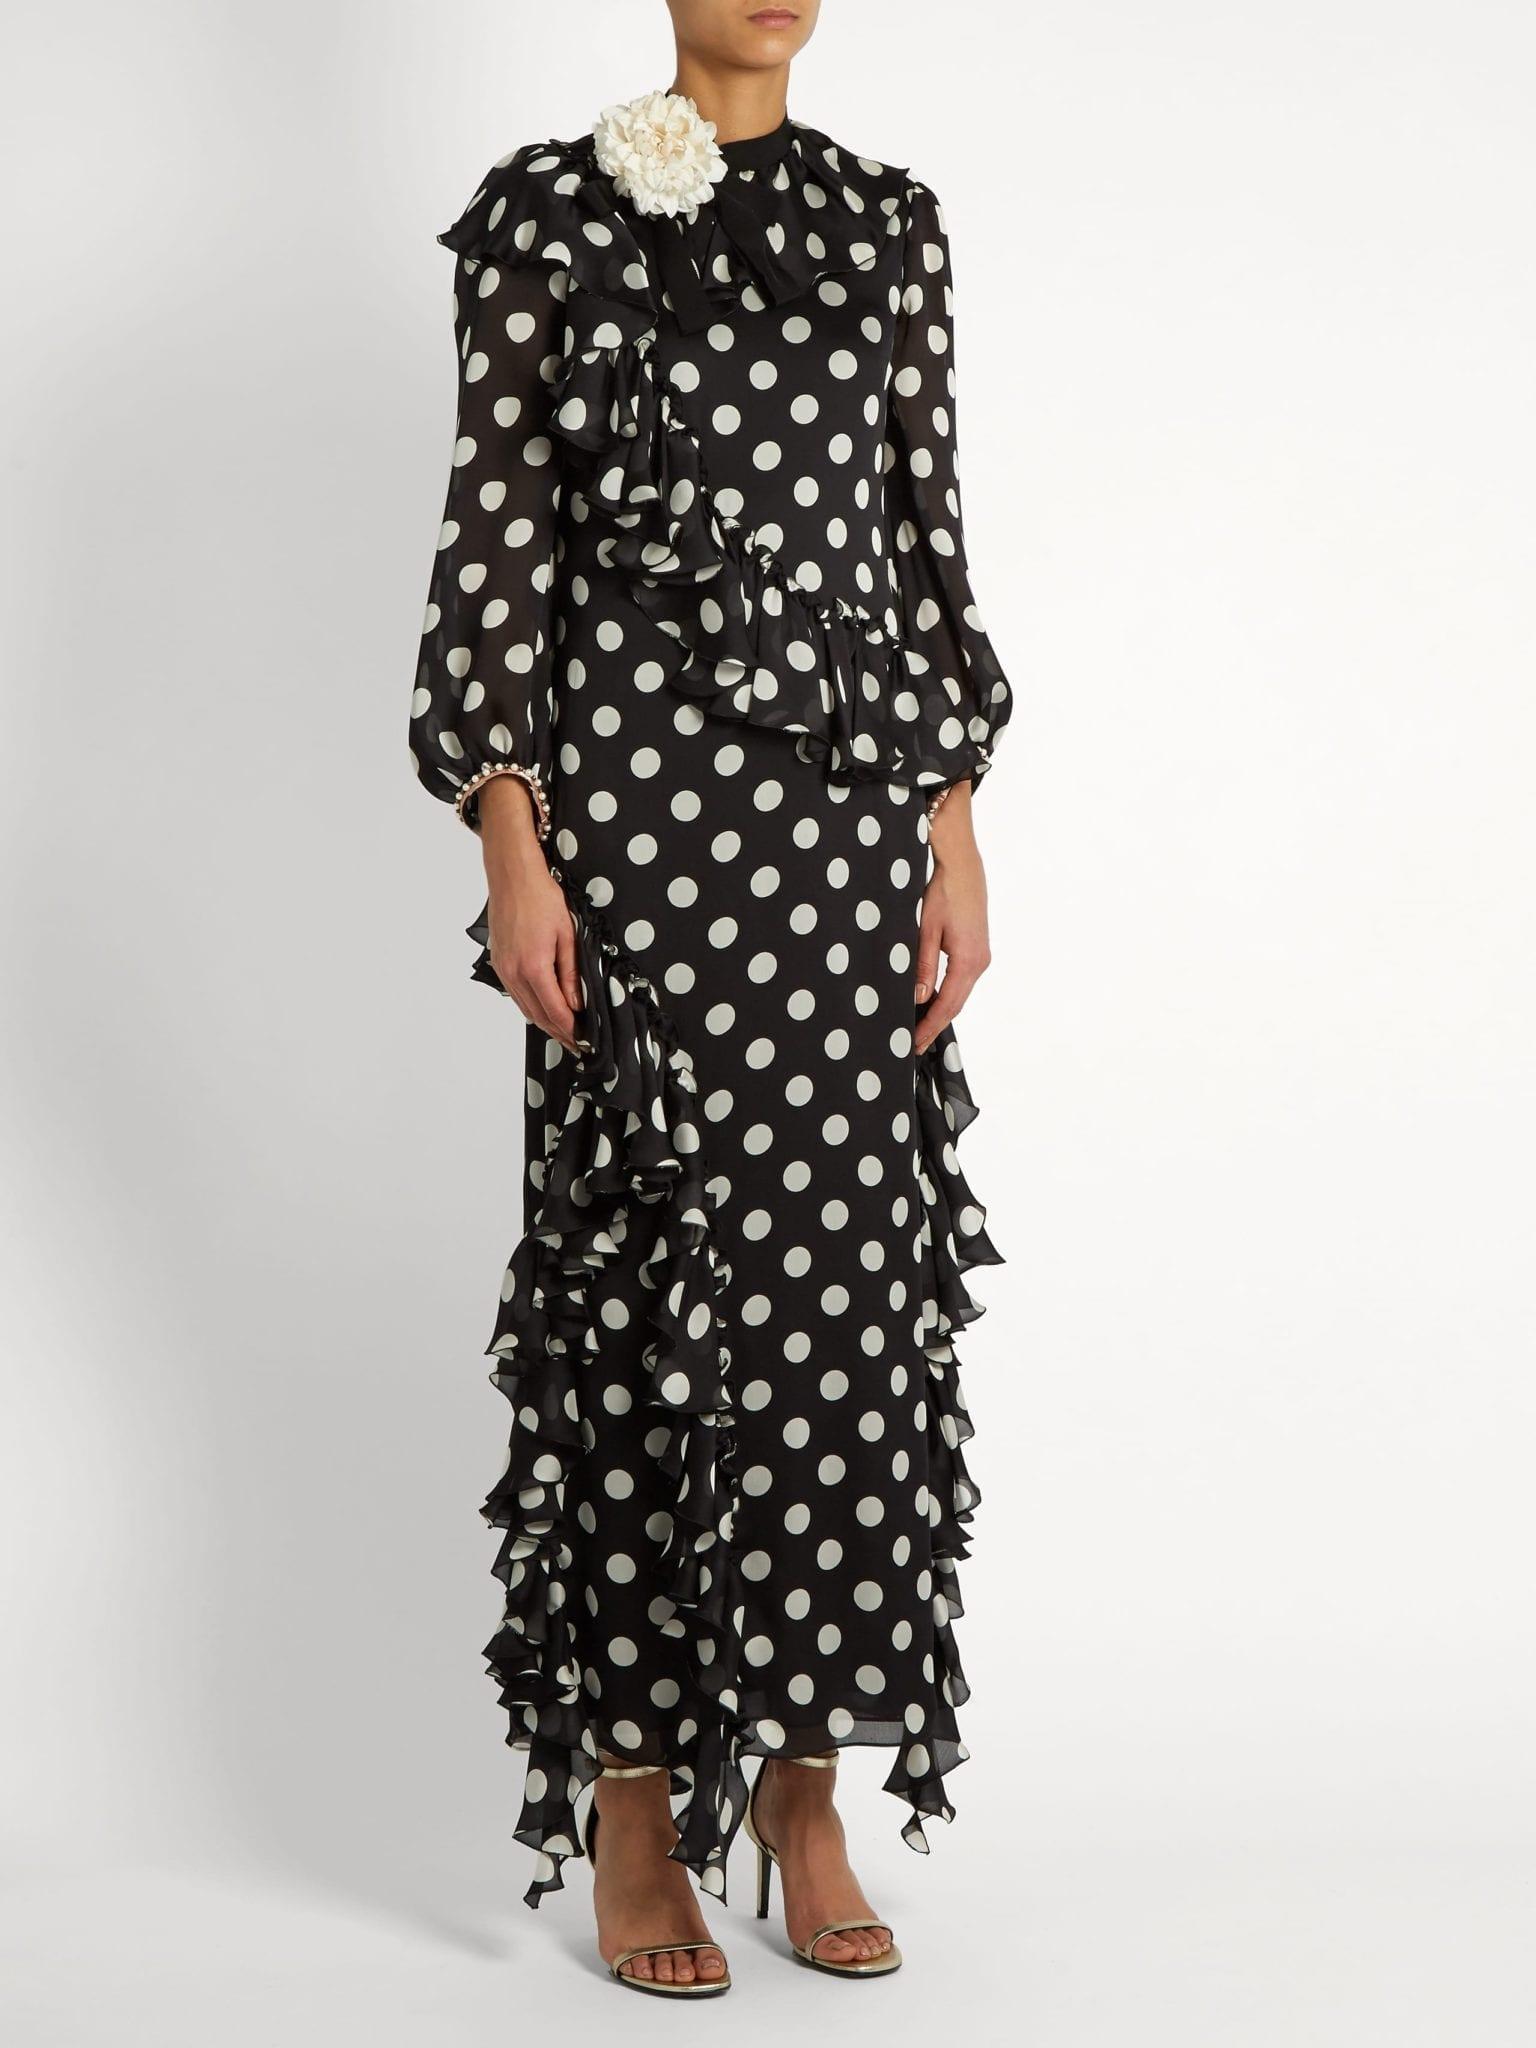 GUCCI Ruffled Polka Dot Georgette Black Gown - We Select Dresses